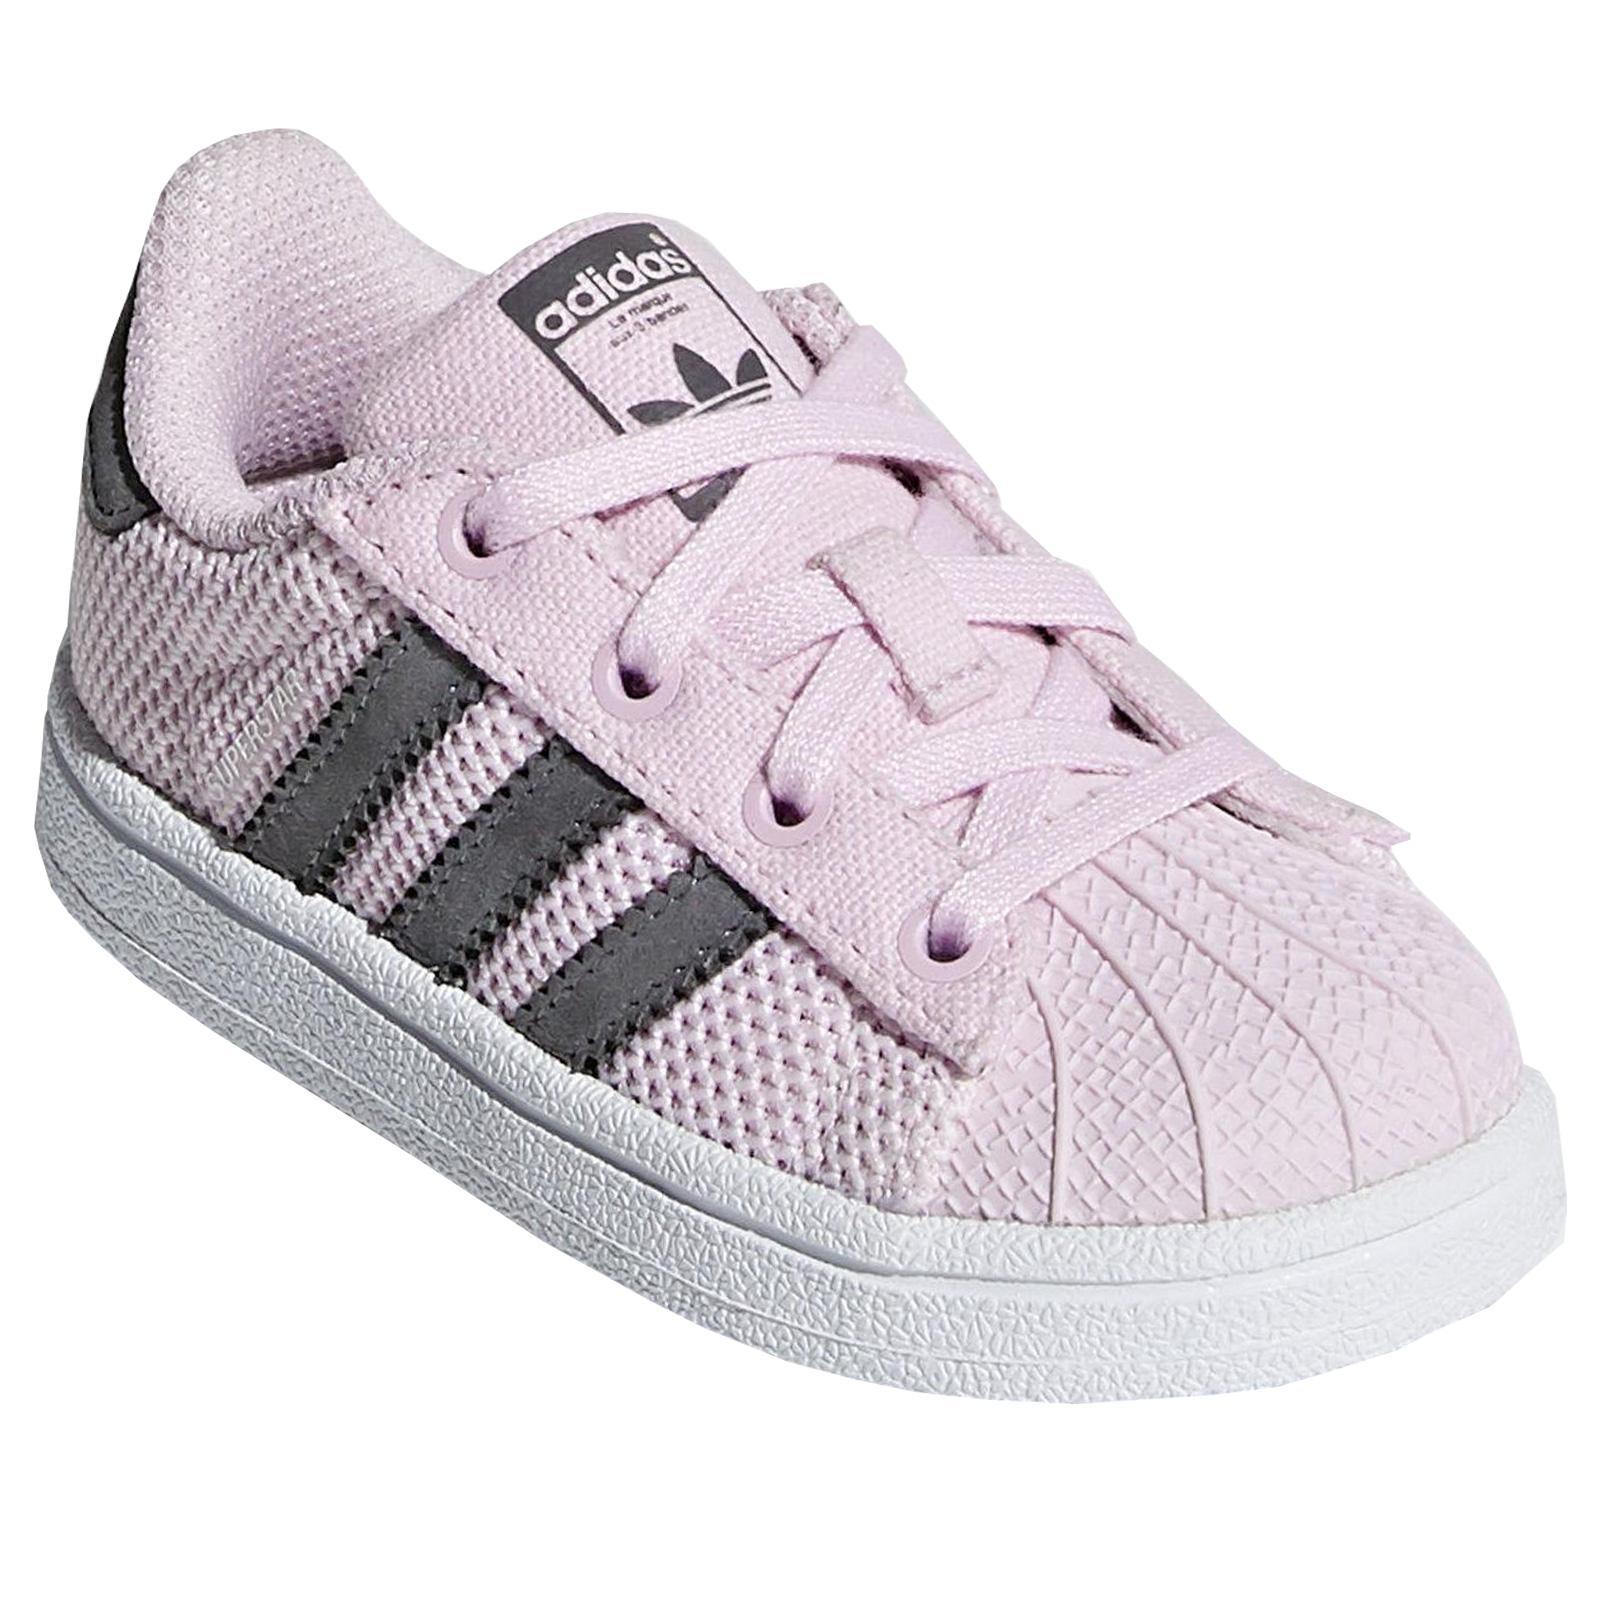 Kinder Mädchen Jogginghosen | adidas AT